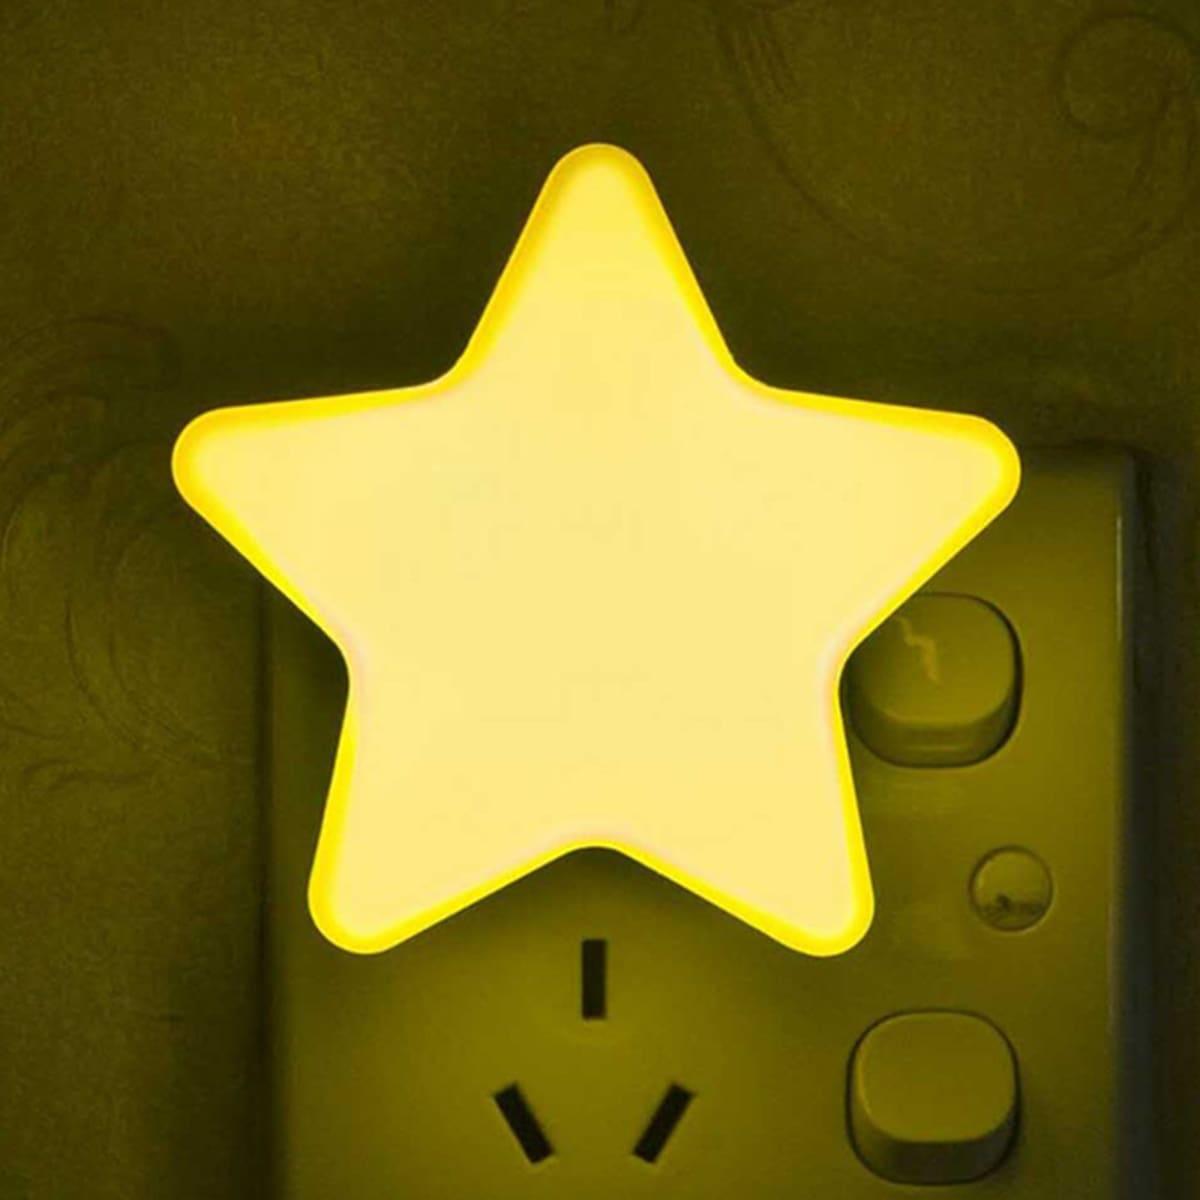 1pc ster gevormd nachtlampje